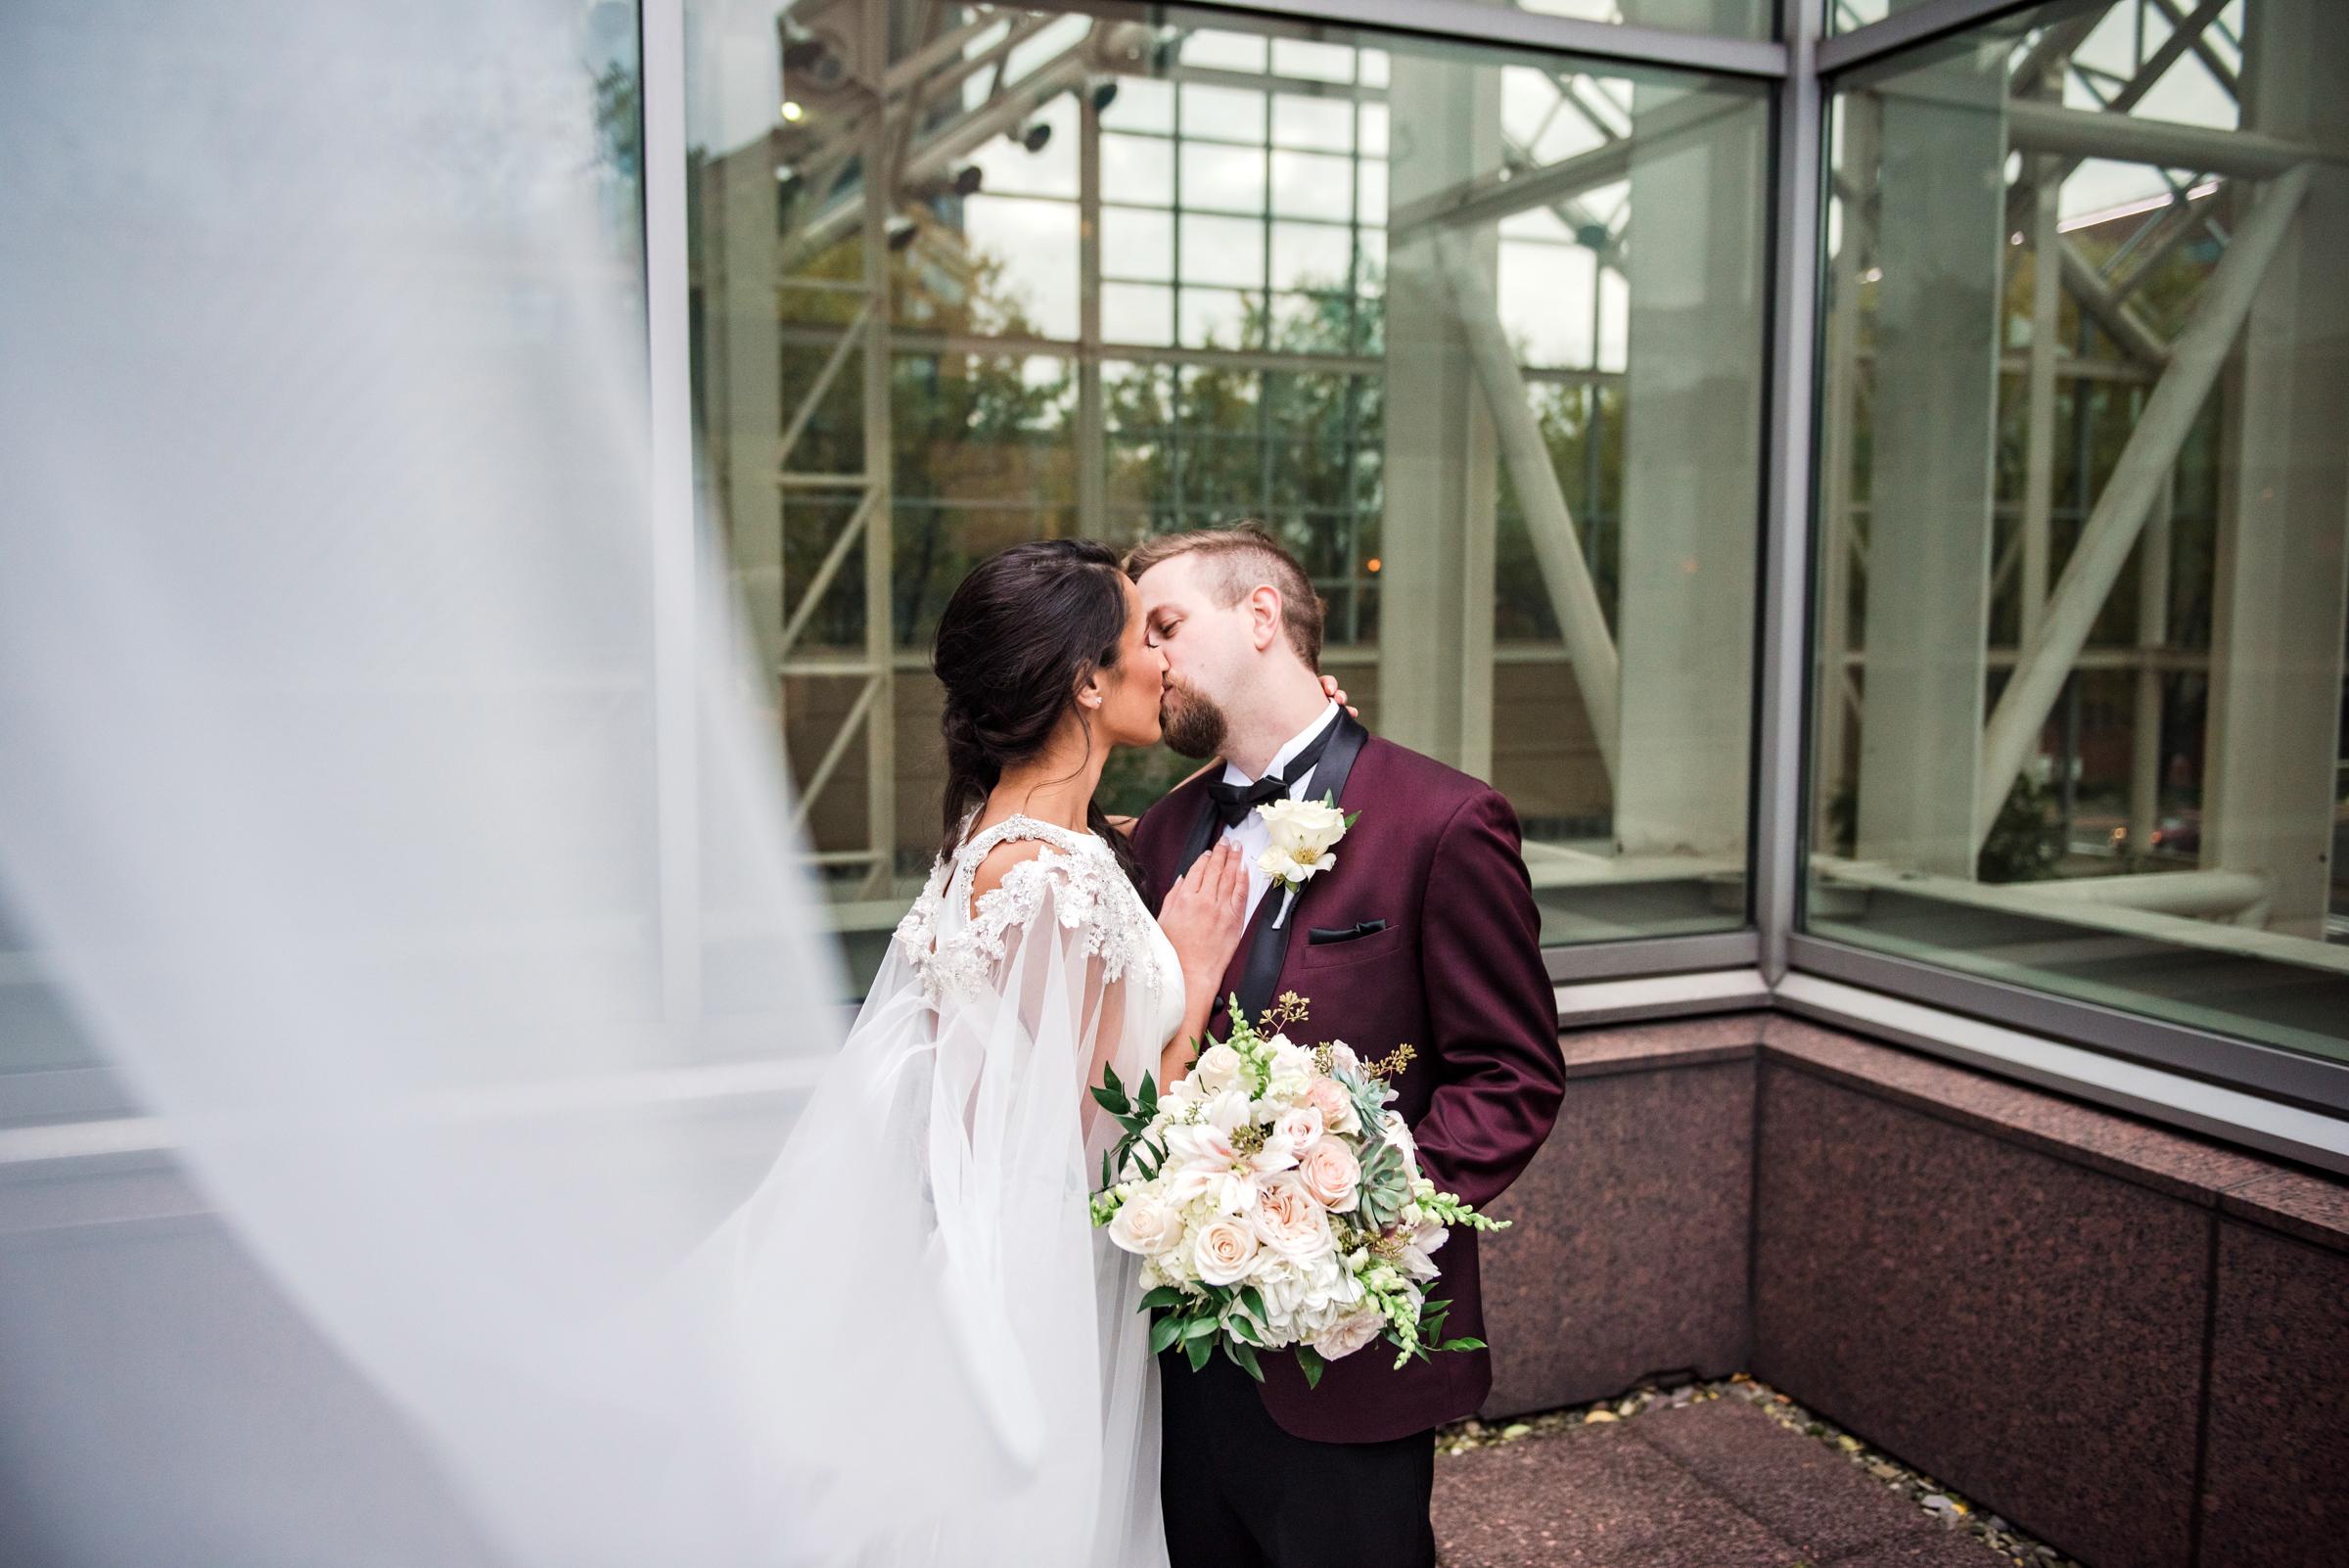 Wintergarden_by_Monroes_Rochester_Wedding_JILL_STUDIO_Rochester_NY_Photographer_174605.jpg